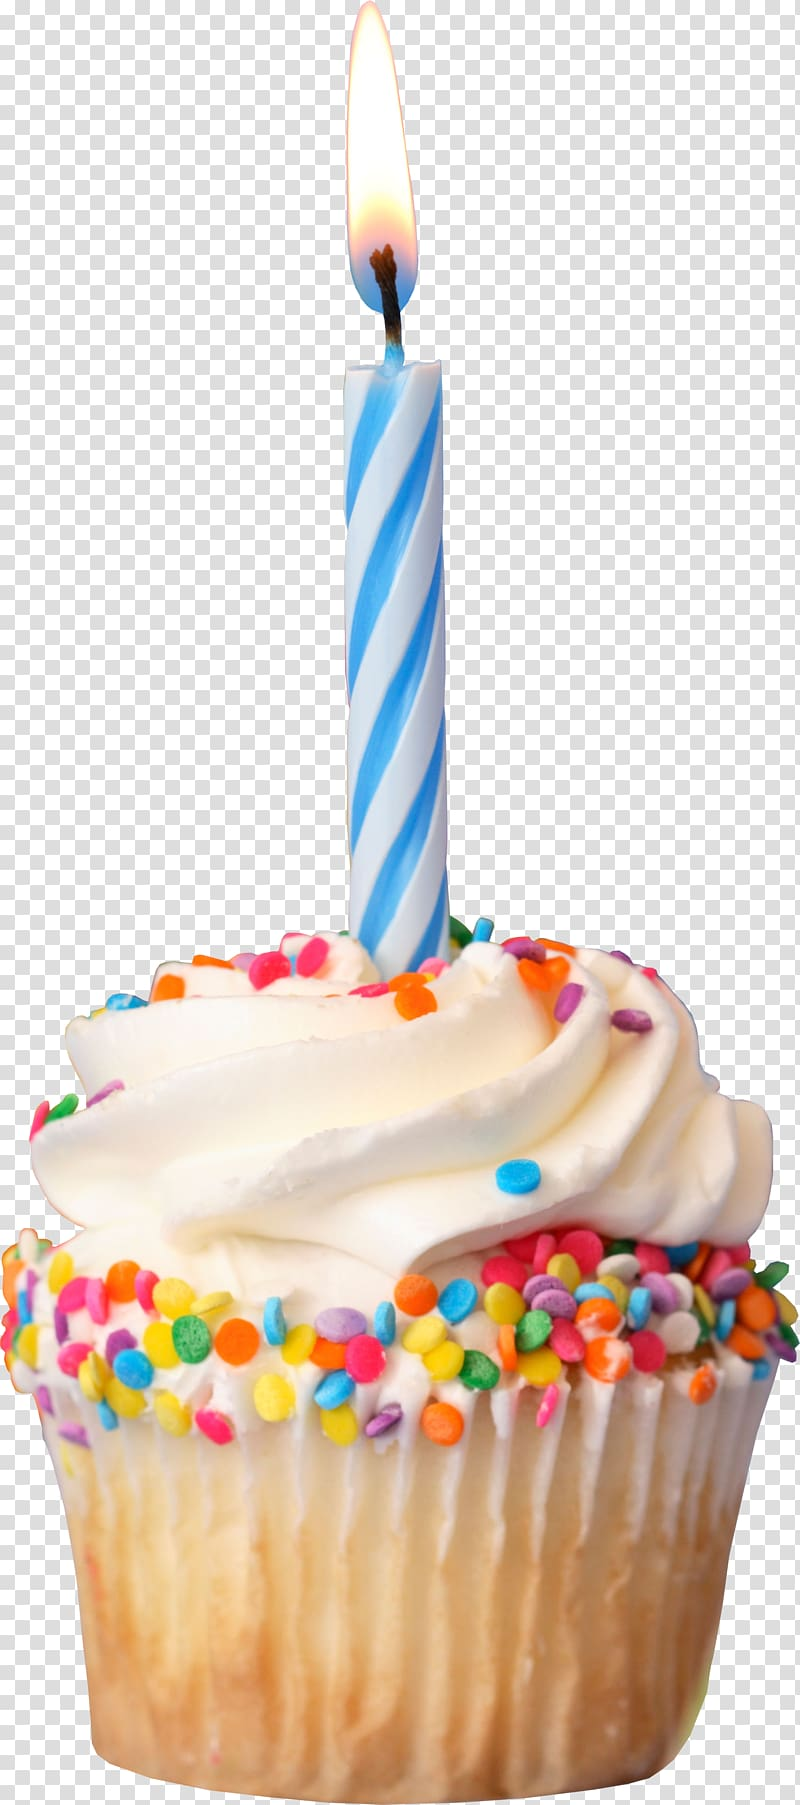 Pastel De Cumpleanos De La Magdalena Cumpleanos Fondo Transparente Png Clipart Birthday Cupcakes Happy Birthday Cupcakes Happy Birthday Cakes